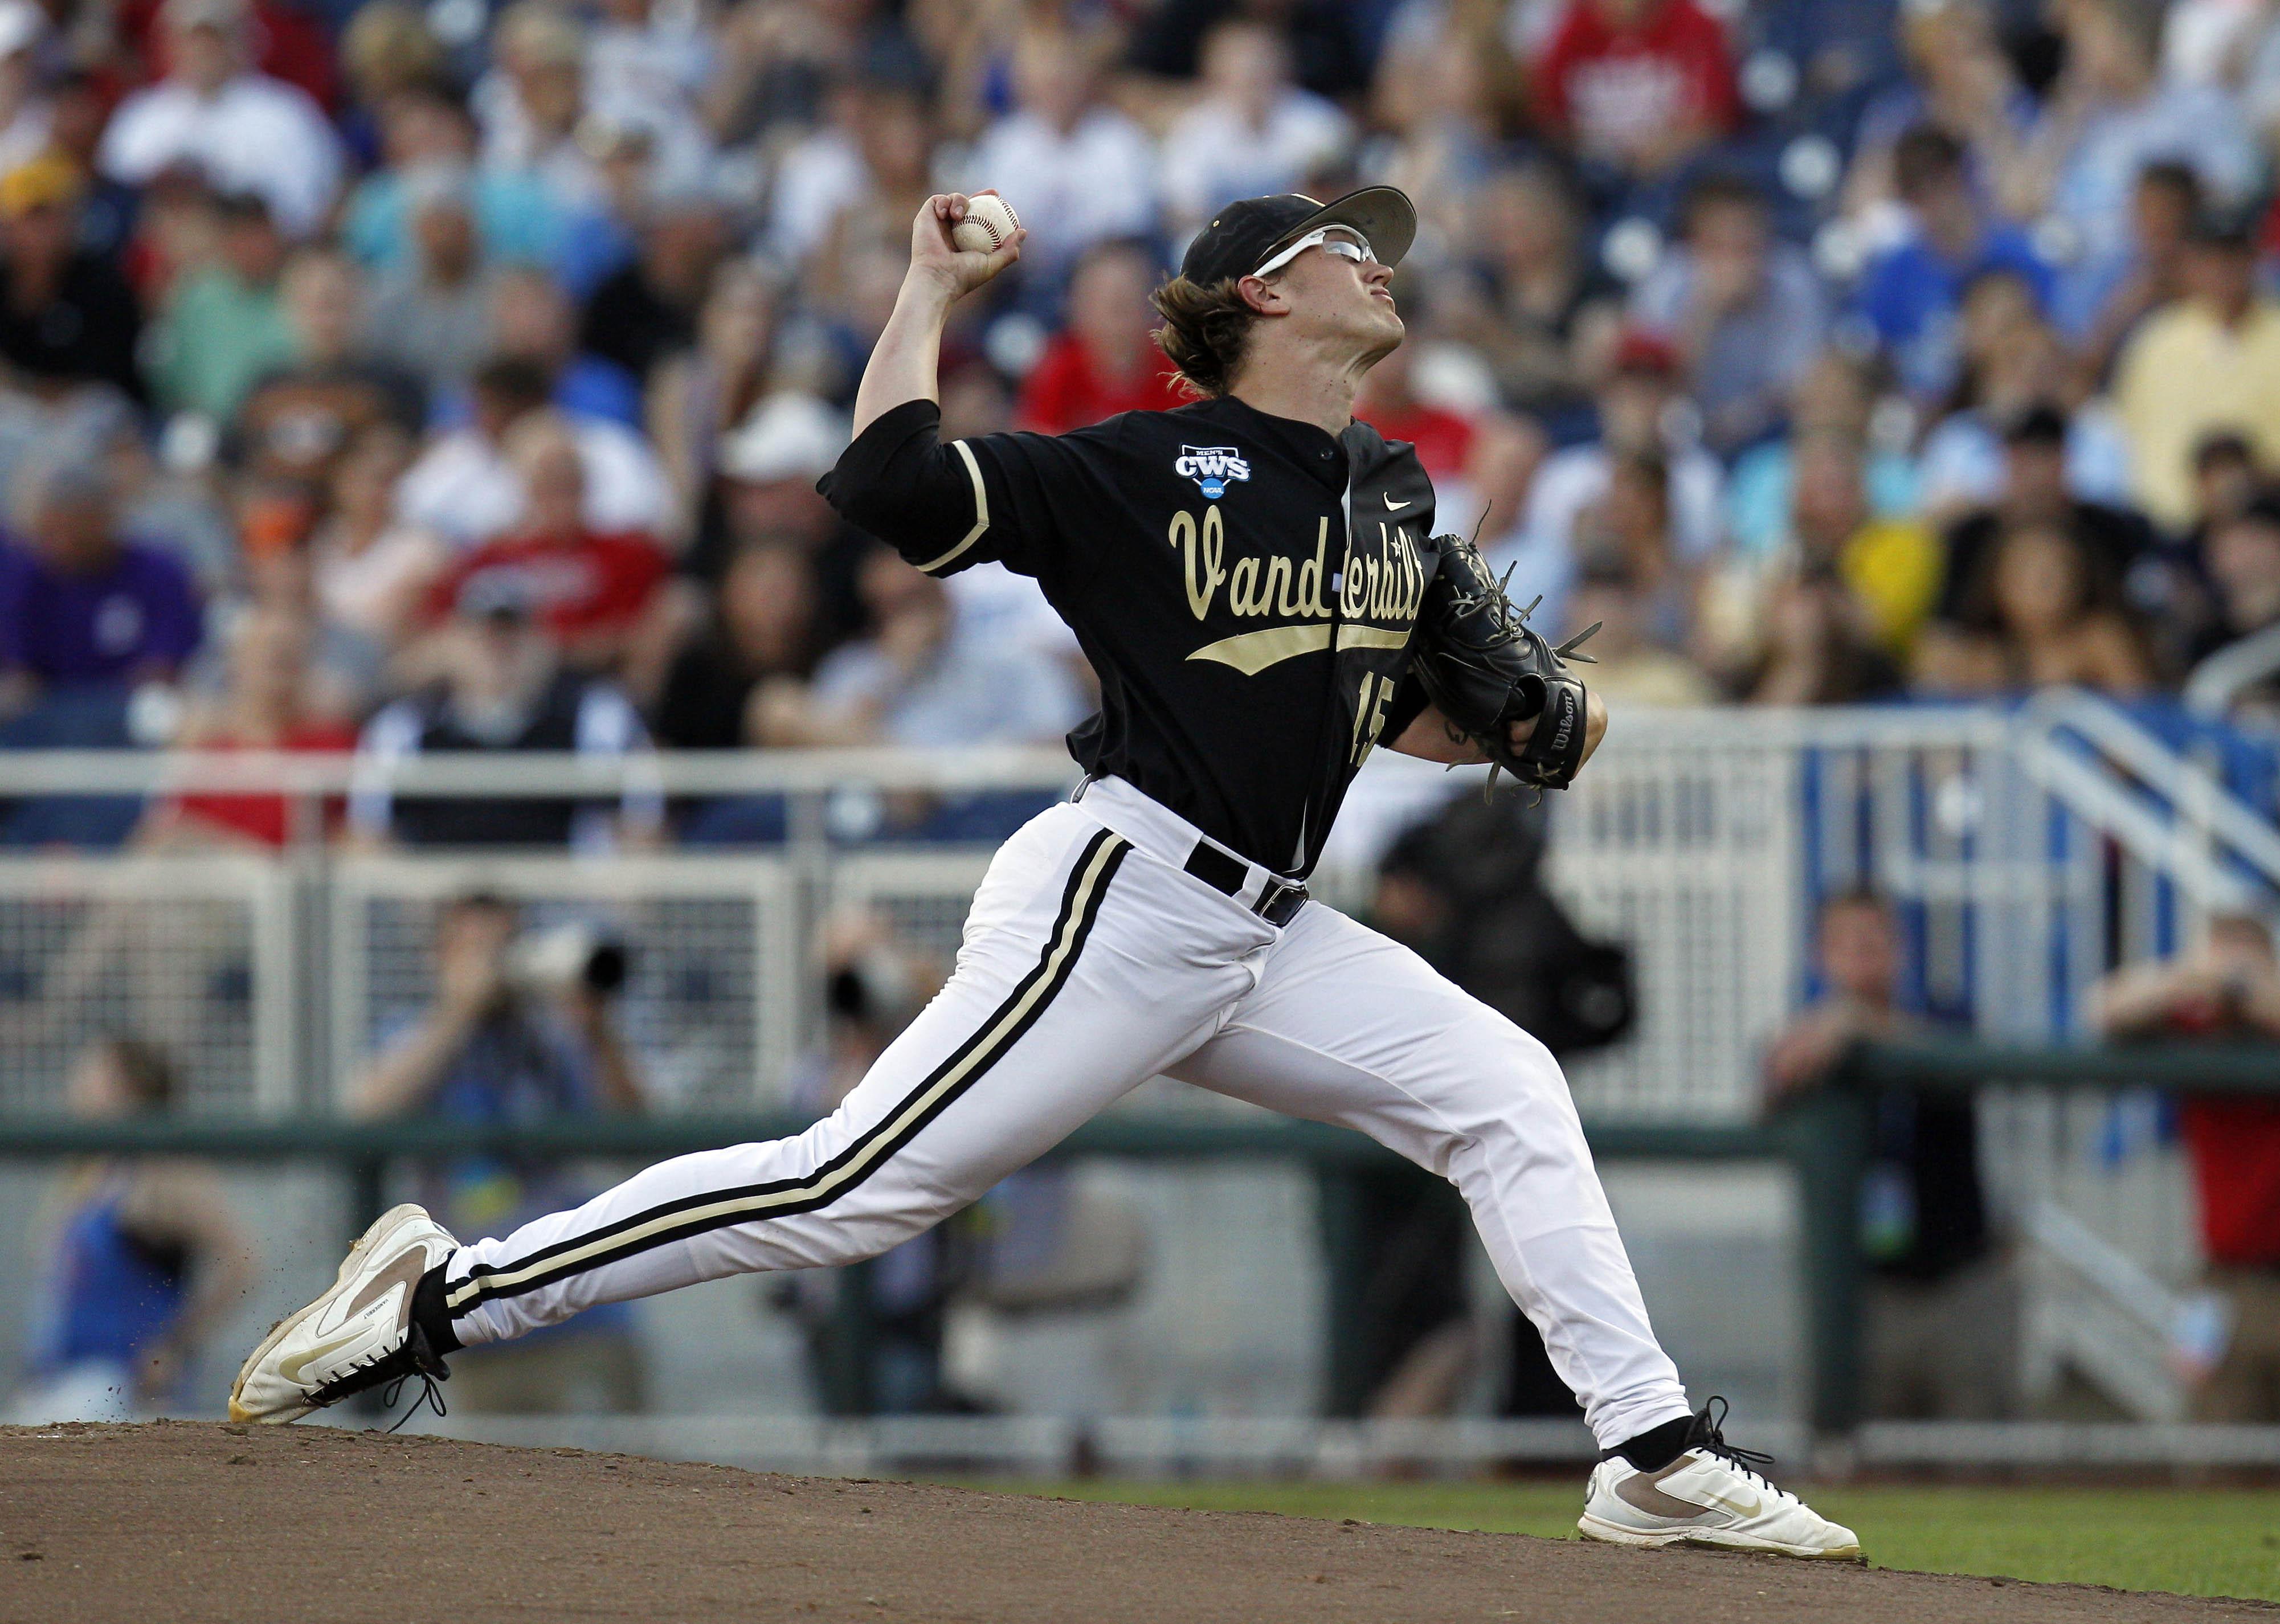 Will Carson Fulmer and Vanderbilt defend their title?